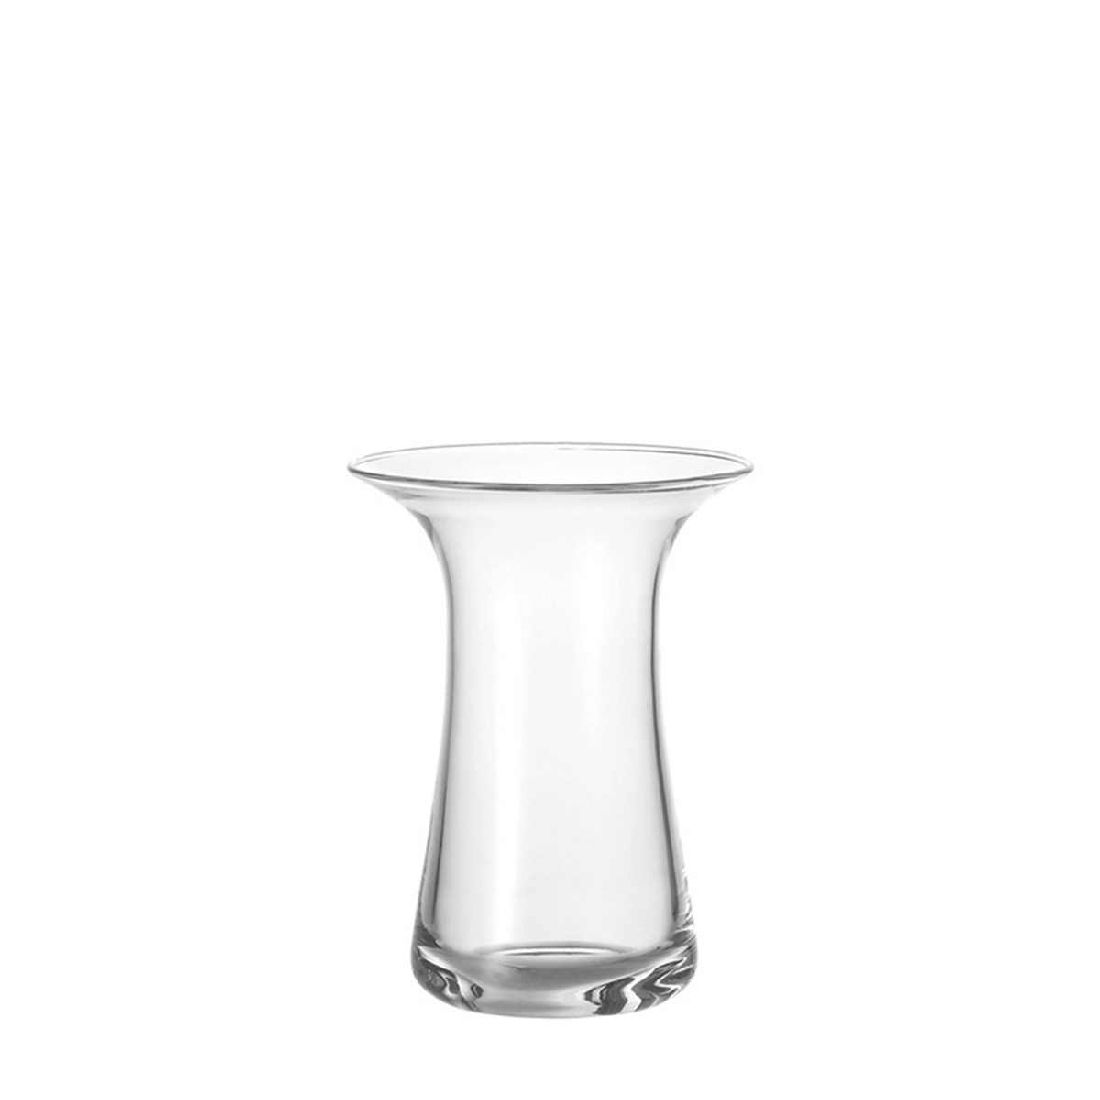 Vase Fluent - 22 cm, Leonardo